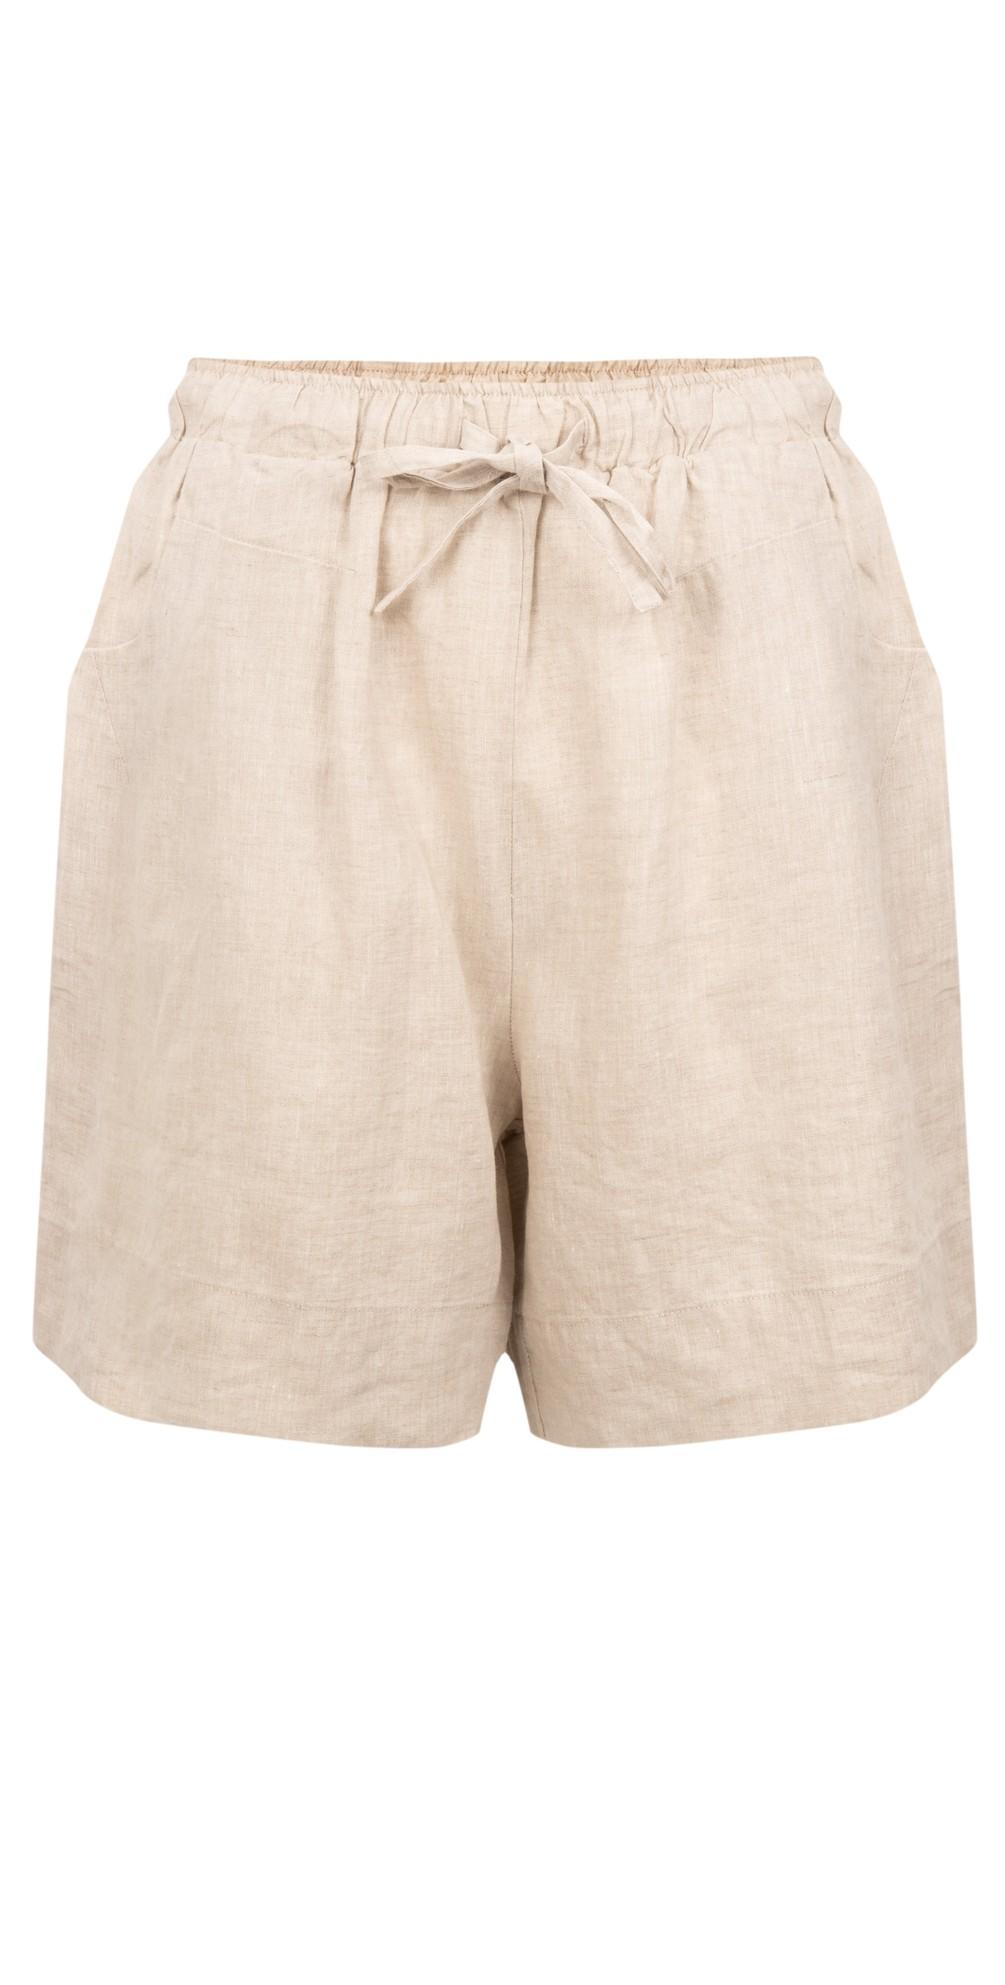 Classic Shorts main image